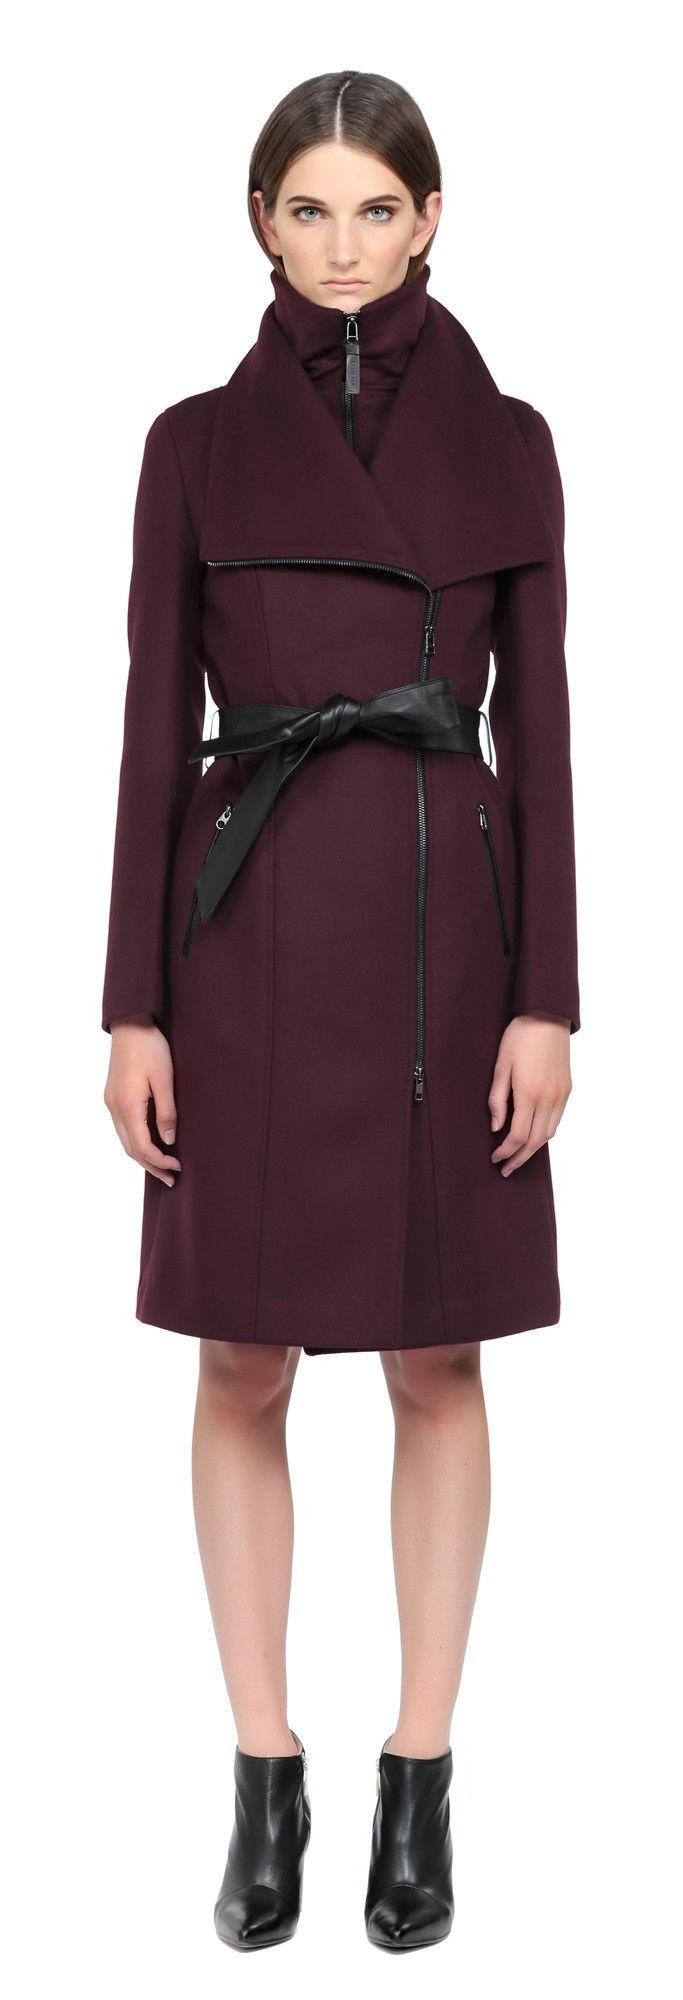 Mackage - Manteau en laine Nori